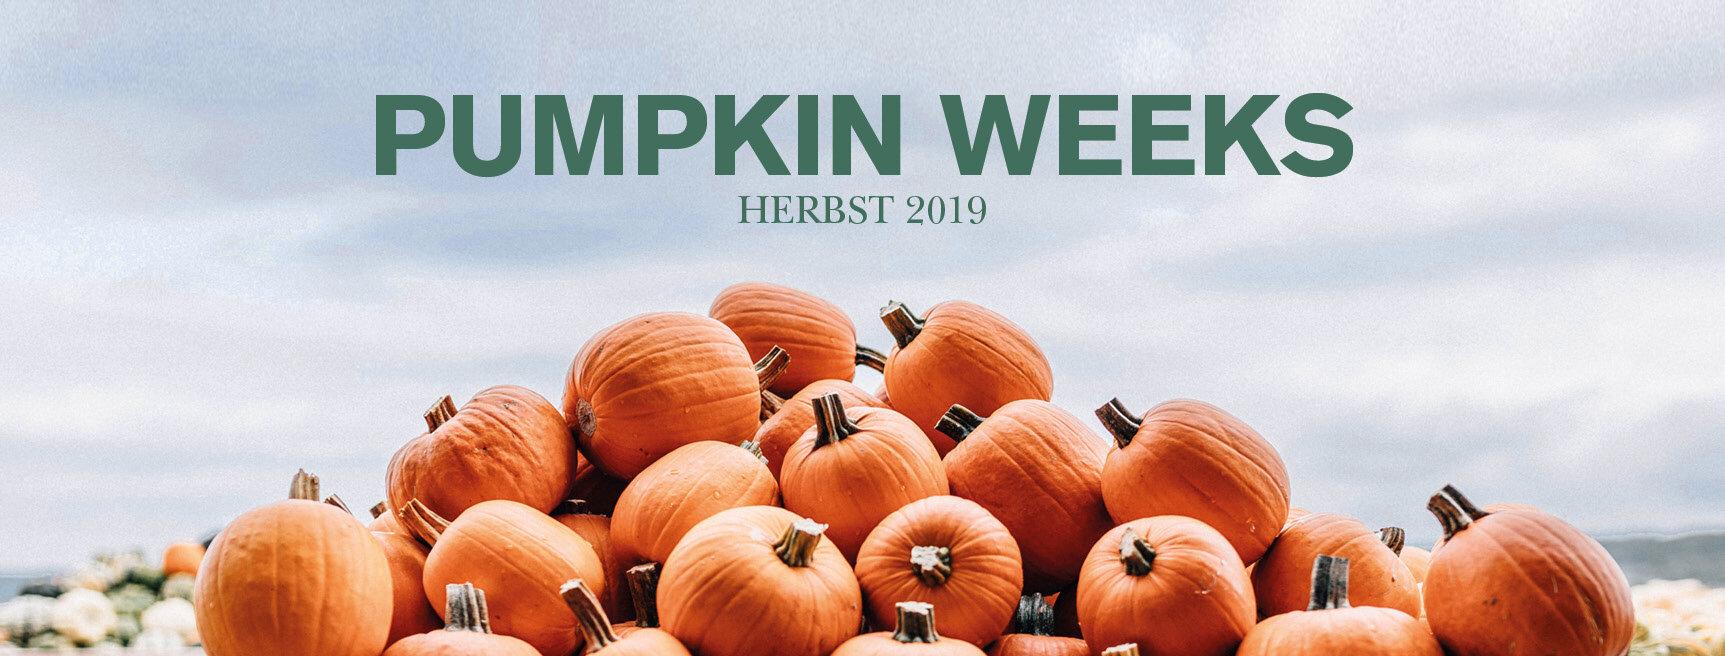 IRO_Pumpkin_Weeks_19_FB_Header_RZ_Screen.jpg